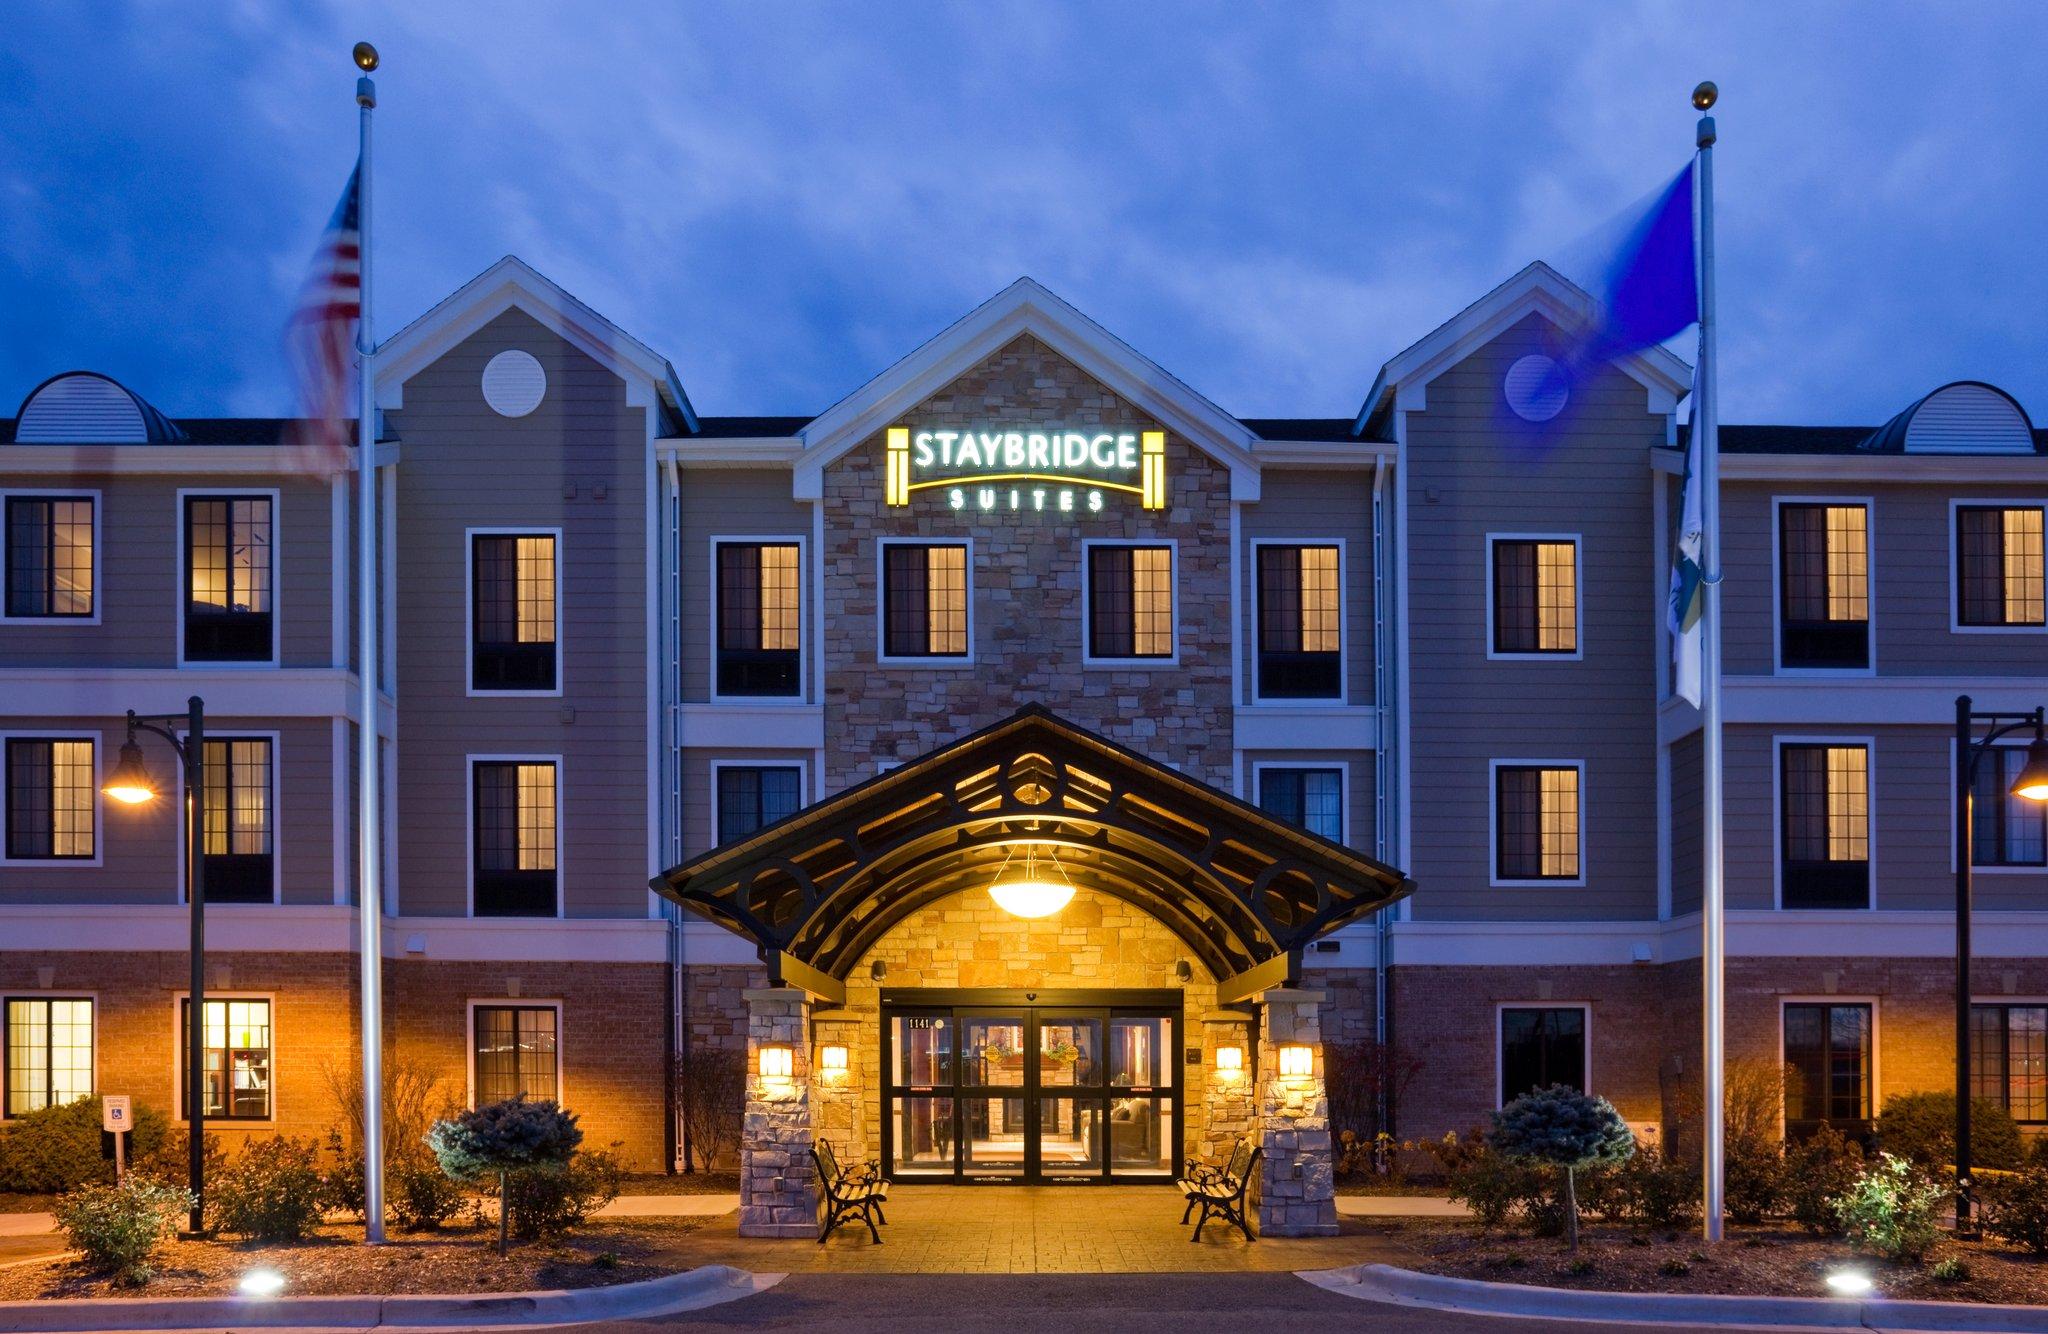 Staybridge Suites West-Oconomowoc